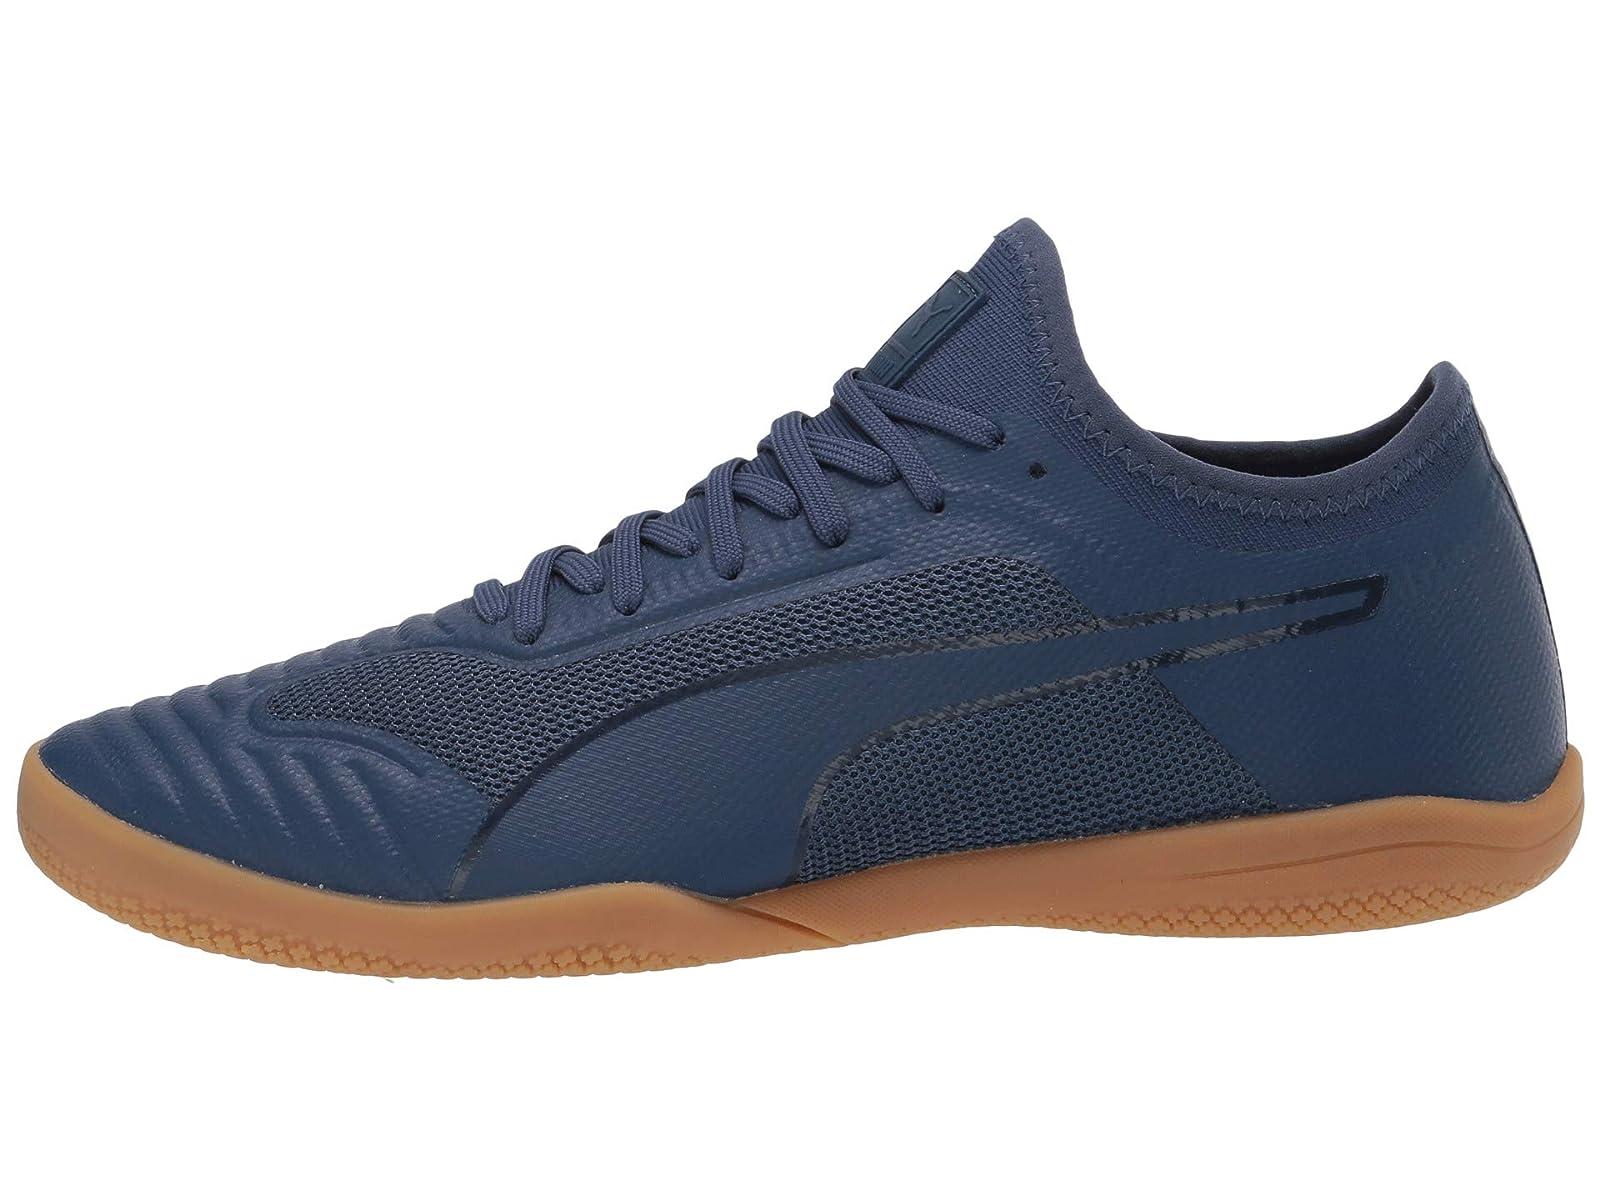 Man-039-s-Sneakers-amp-Athletic-Shoes-PUMA-365-Sala-1 thumbnail 5